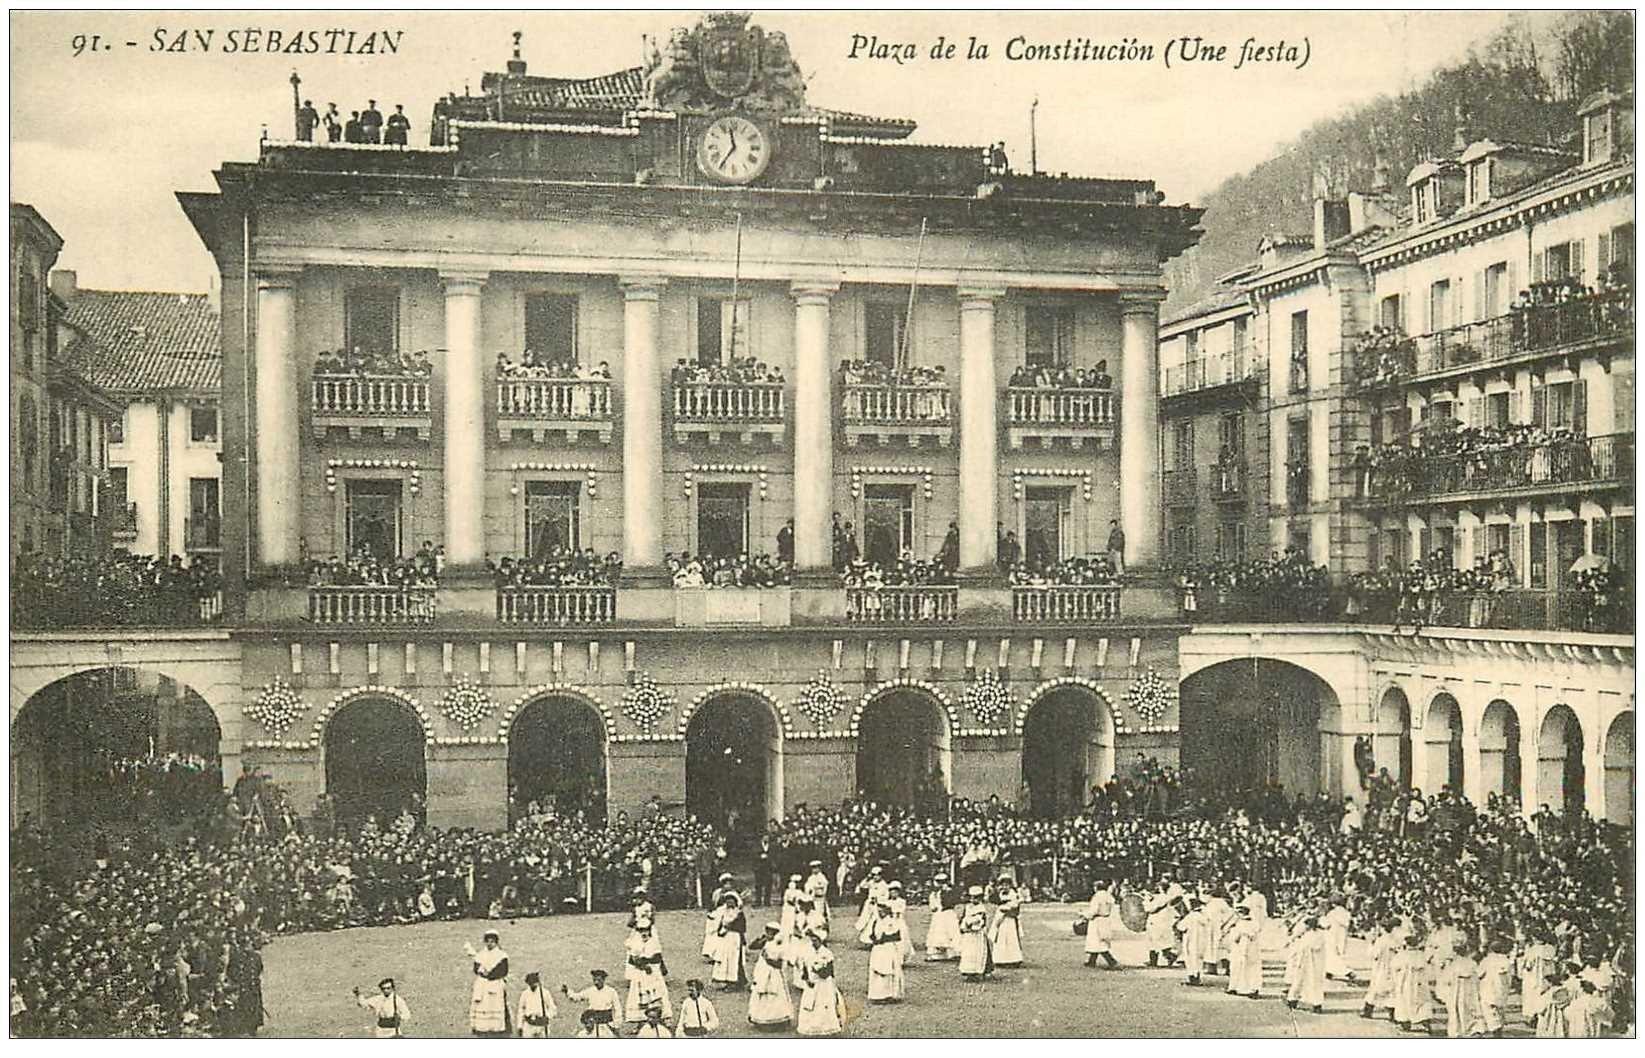 carte postale ancienne Espagne. SAN SEBASTIAN. Fiesta Plaza de la Constitucion